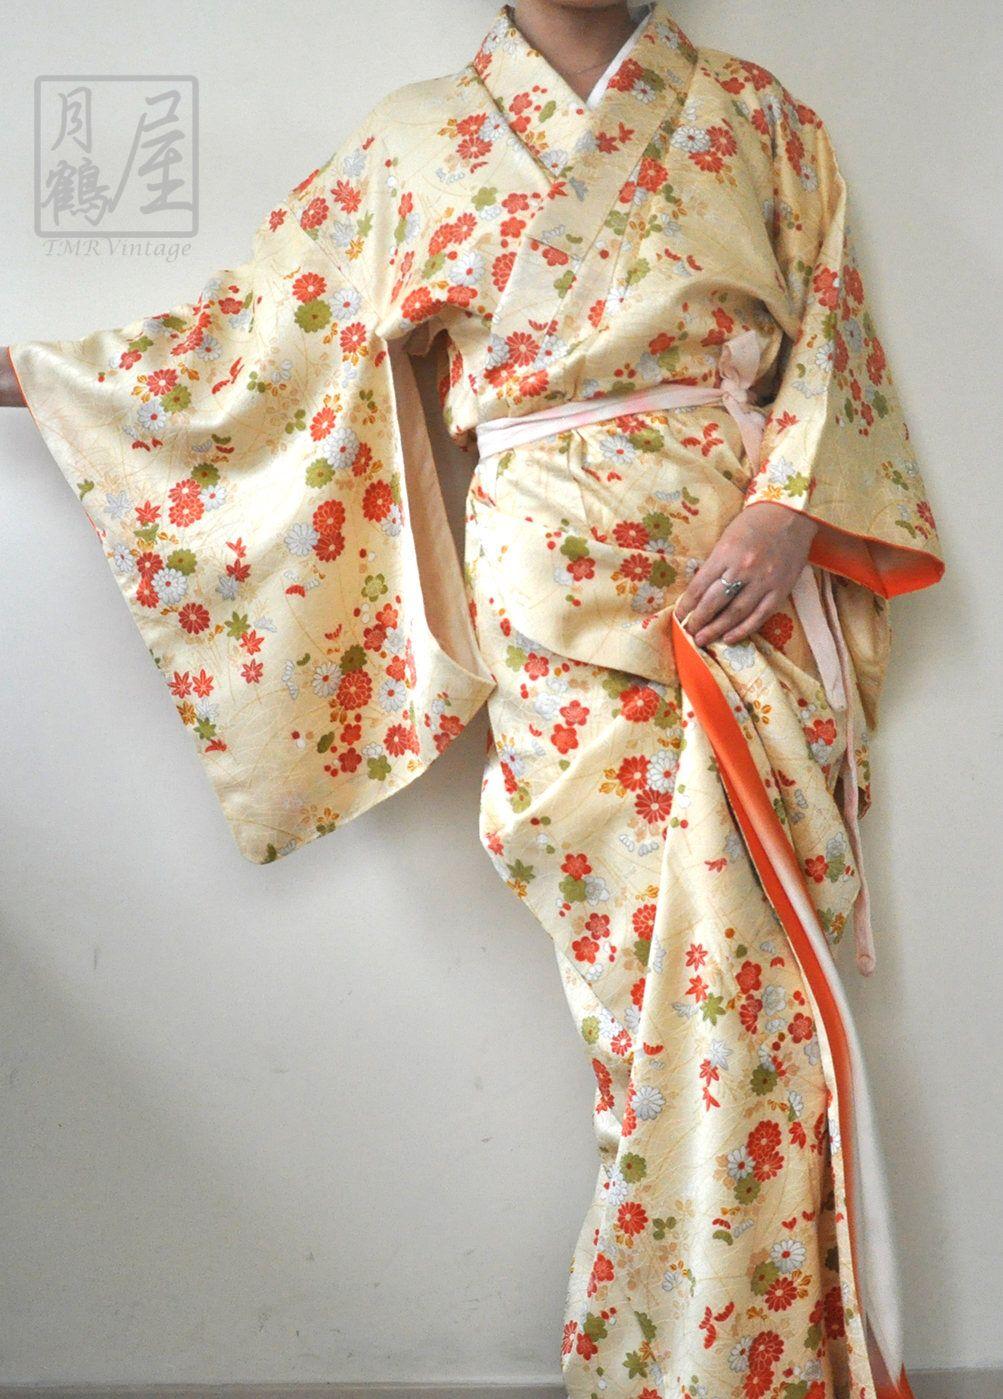 bd502be56 Long silk kimono robe/vintage japanese full length kimono gown  dress/authenric yellow floral